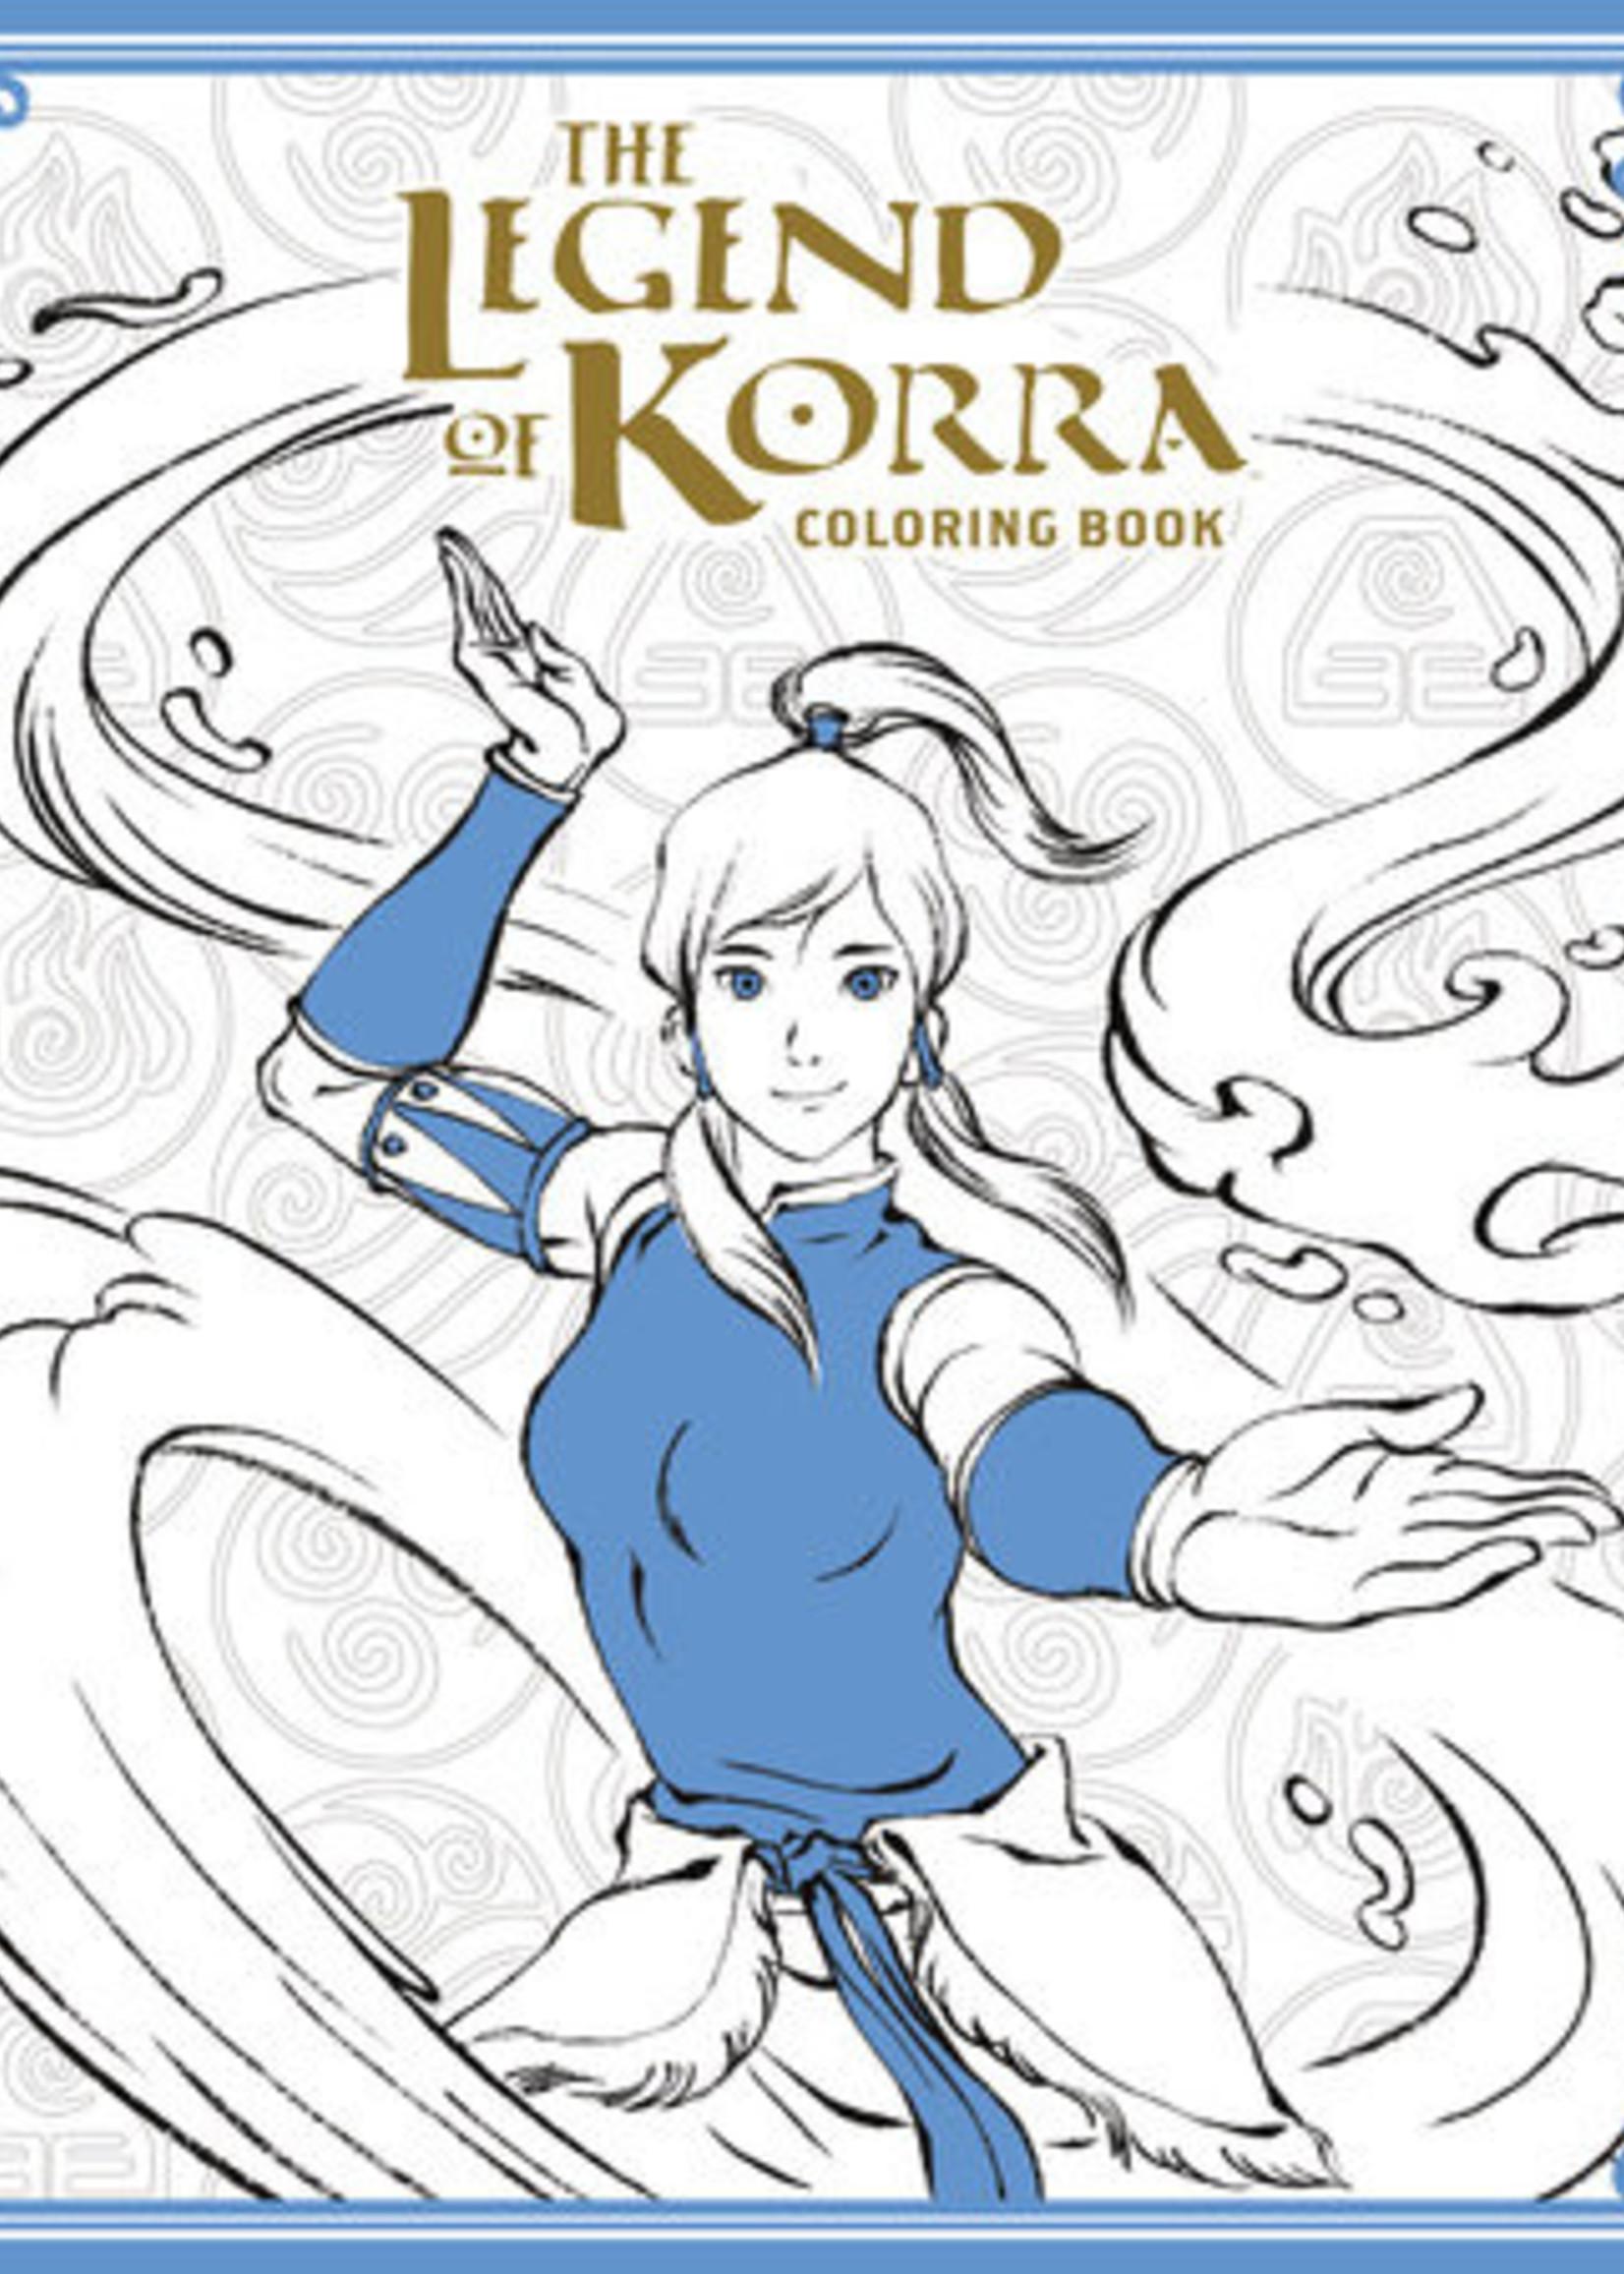 Dark Horse Comics The Legend of Korra Coloring Book - Paperback